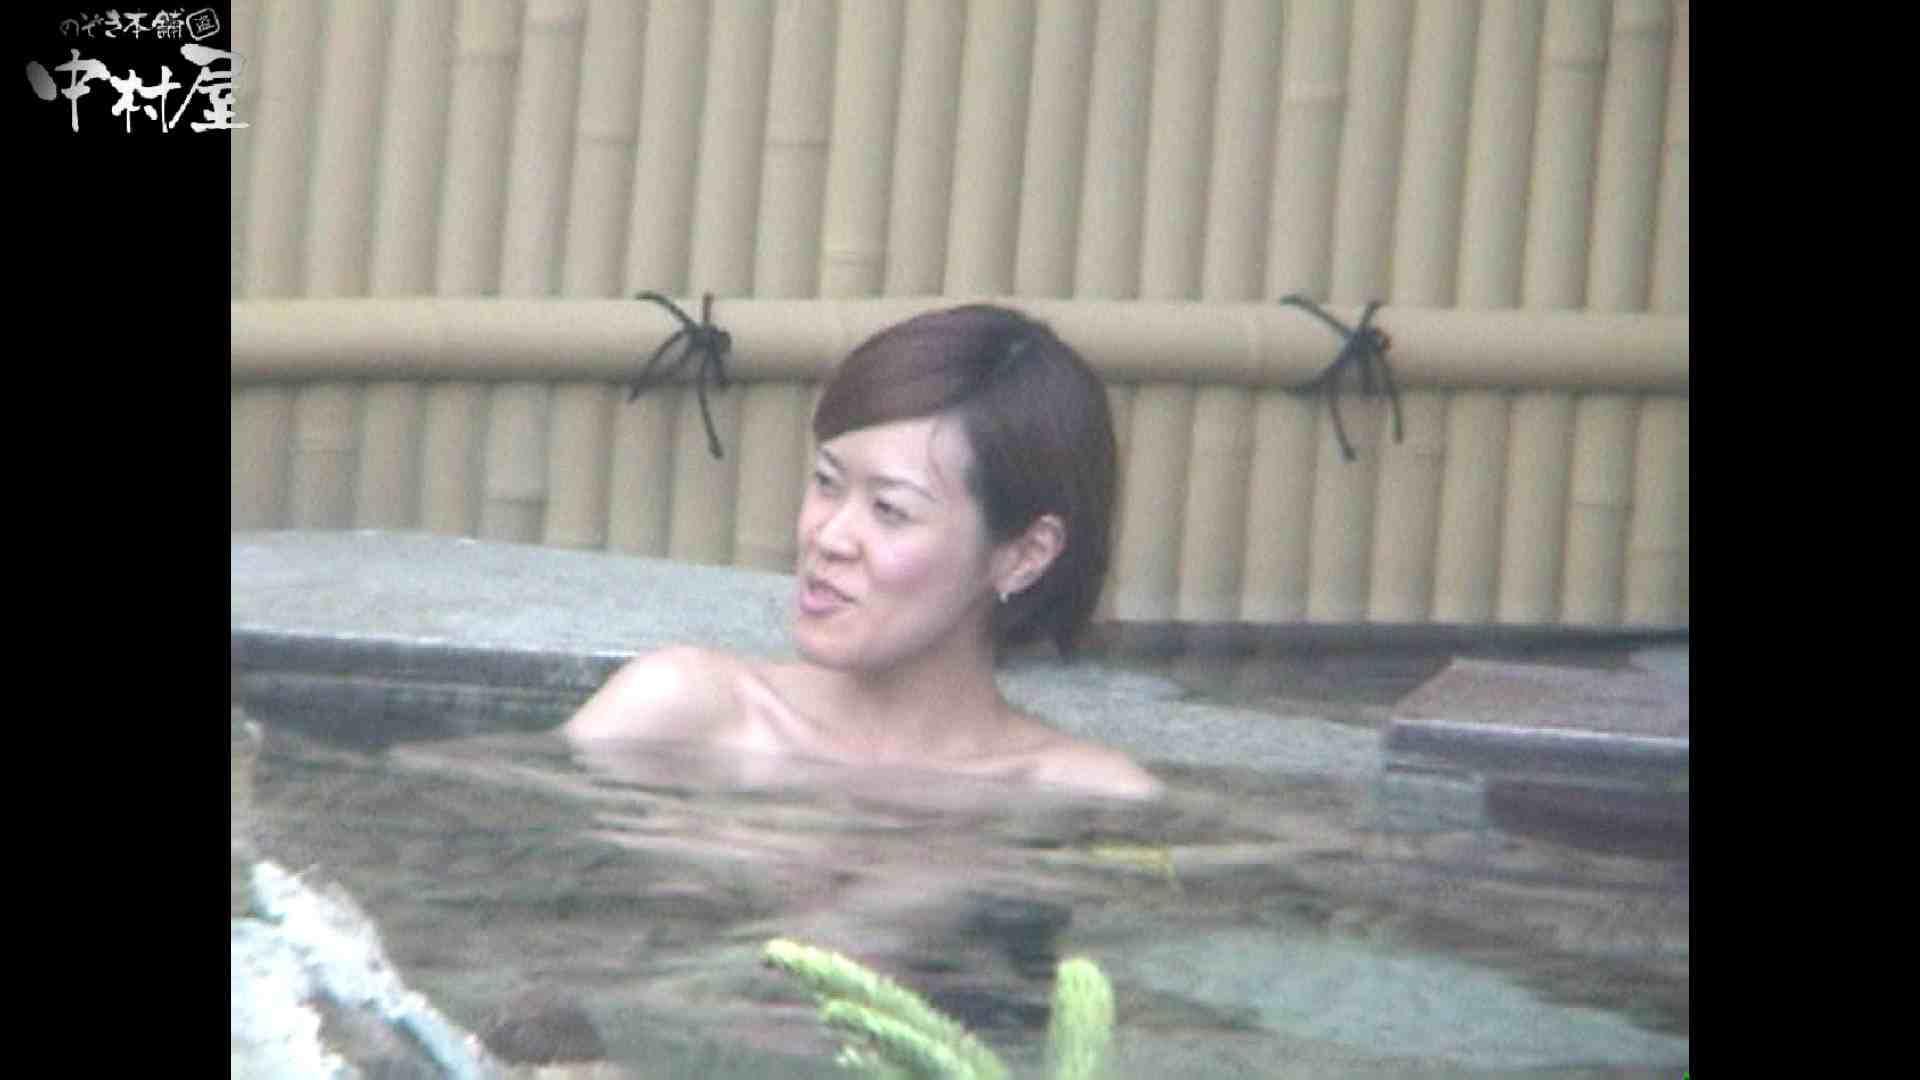 Aquaな露天風呂Vol.961 露天風呂 | OLのエロ生活  104連発 37